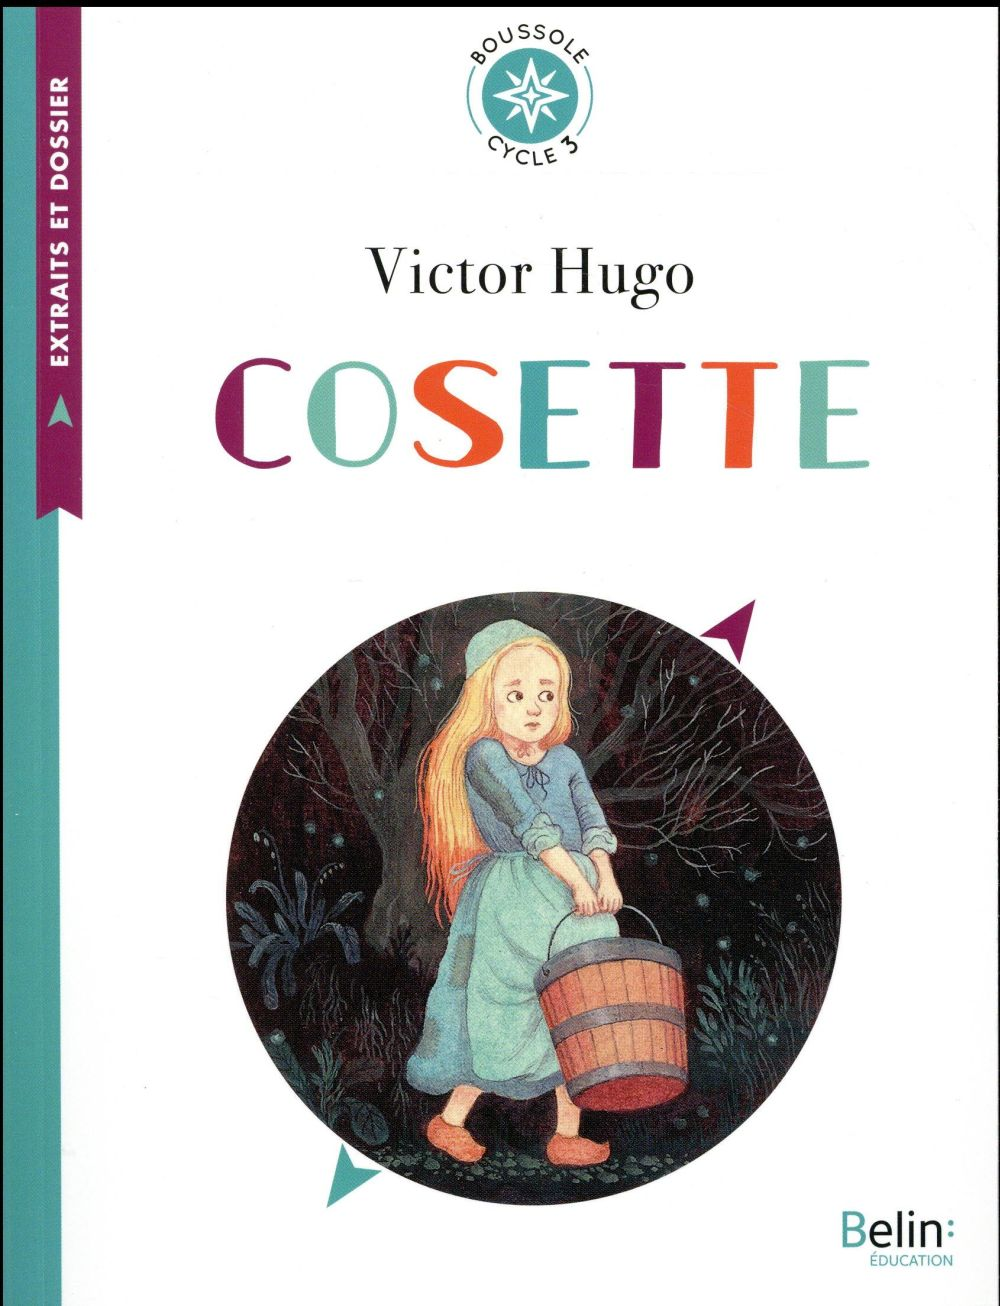 Cosette - boussole cycle 3